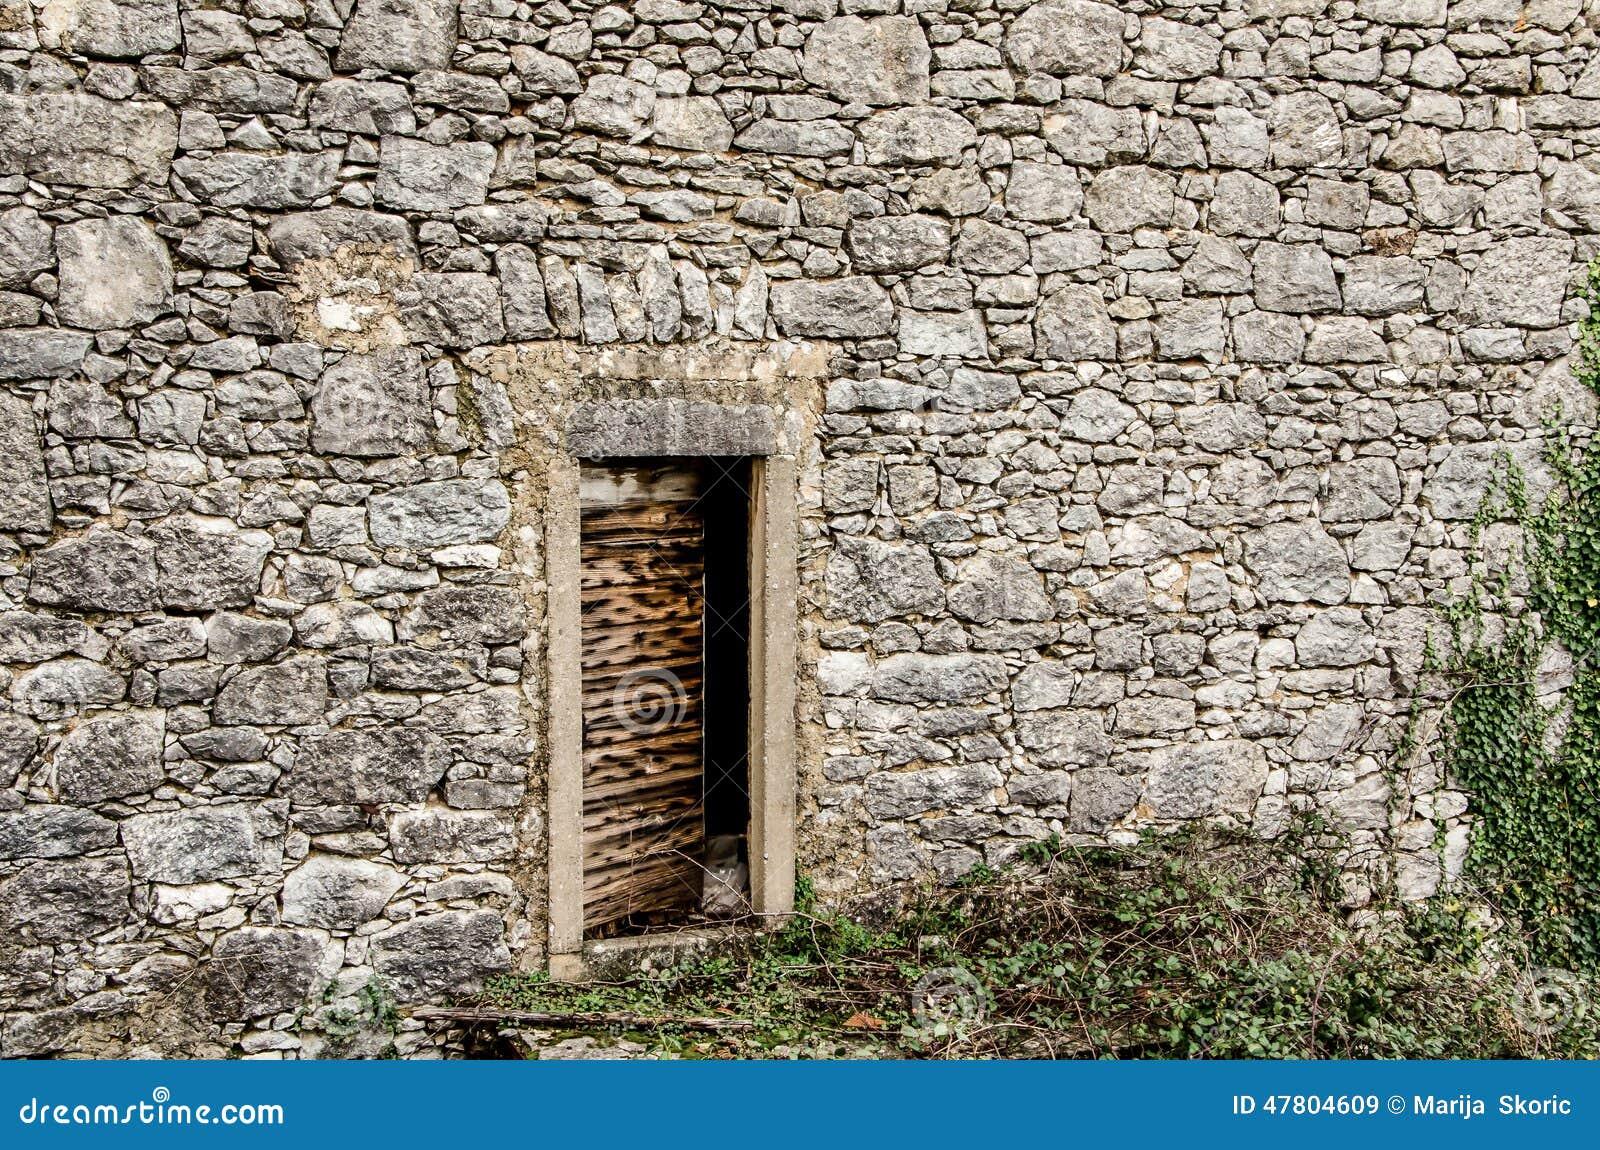 Old door on an old stone house in Dobrinj, island Krk, Croatia.